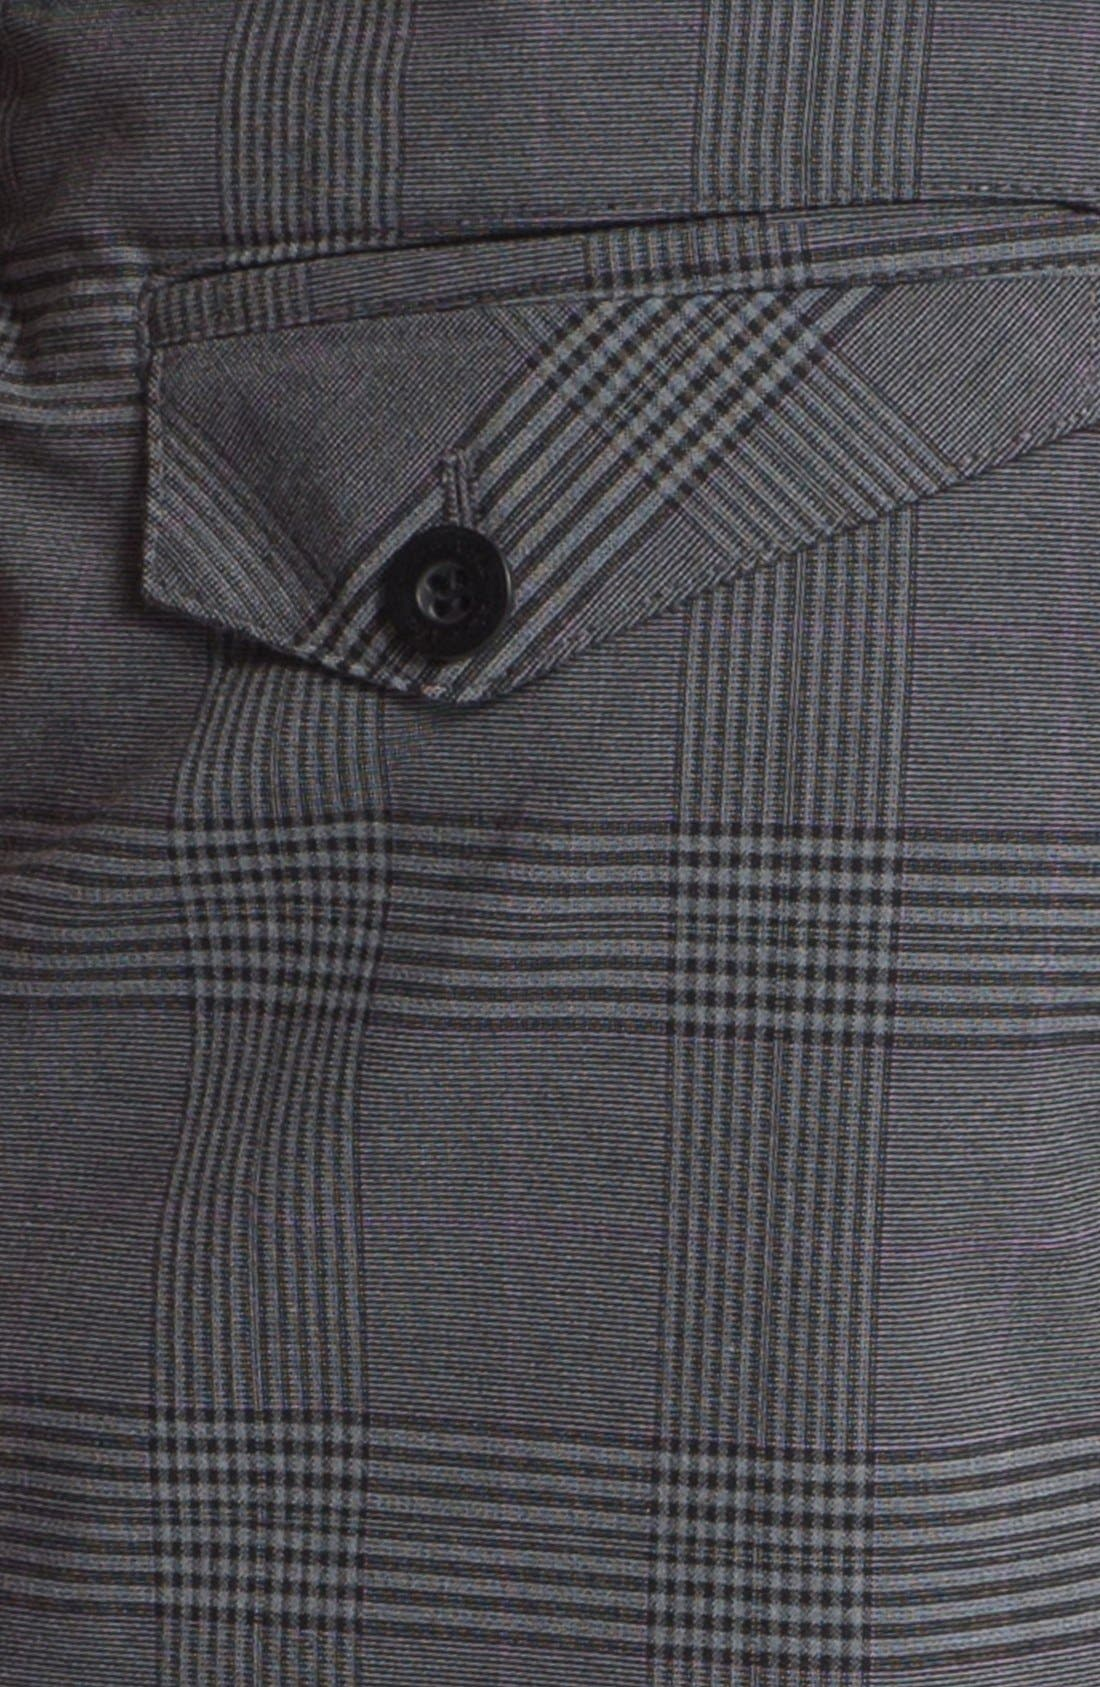 Alternate Image 3  - Travis Mathew 'Consignment' Golf Shorts